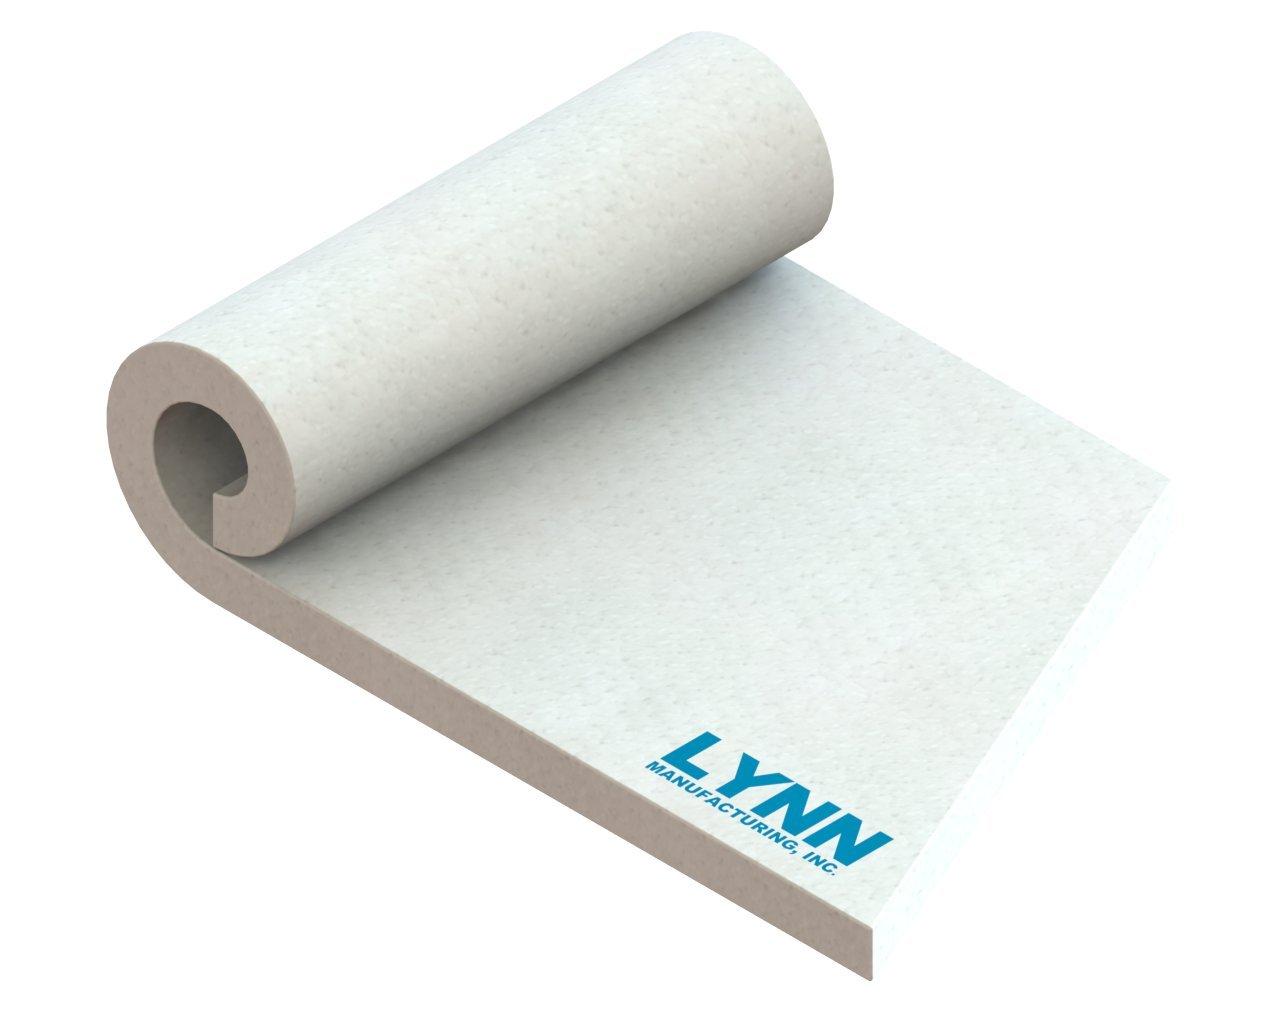 Lynn Manufacturing Replacement Quadrafire Baffle Blanket, Voyageur Grand Acc, SRV7075-187 by Lynn Manufacturing